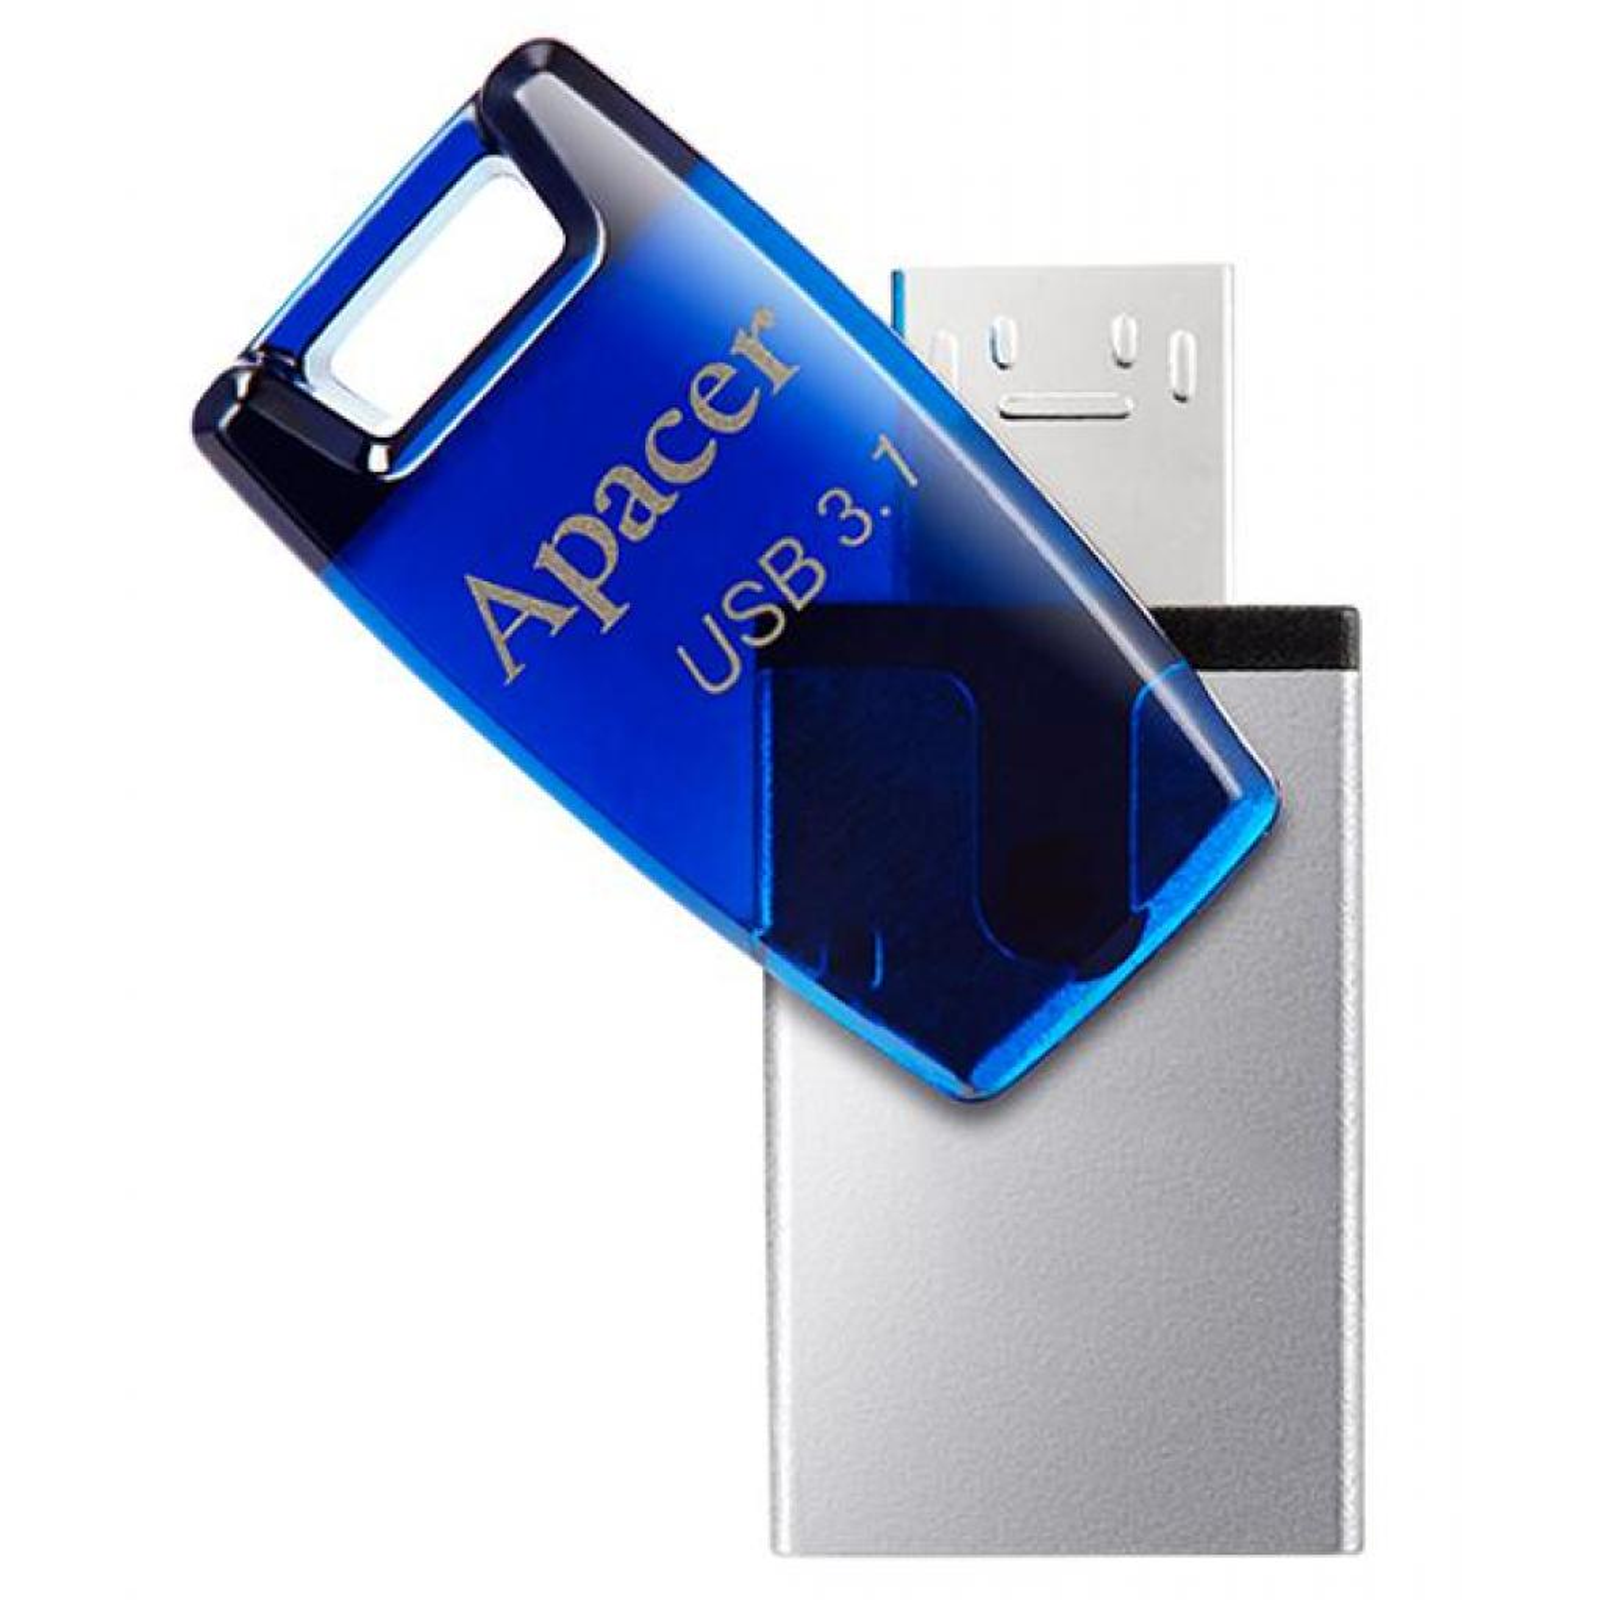 USB флеш накопитель Apacer 8GB AH179 Blue USB 3.1 OTG (AP8GAH179U-1) изображение 2